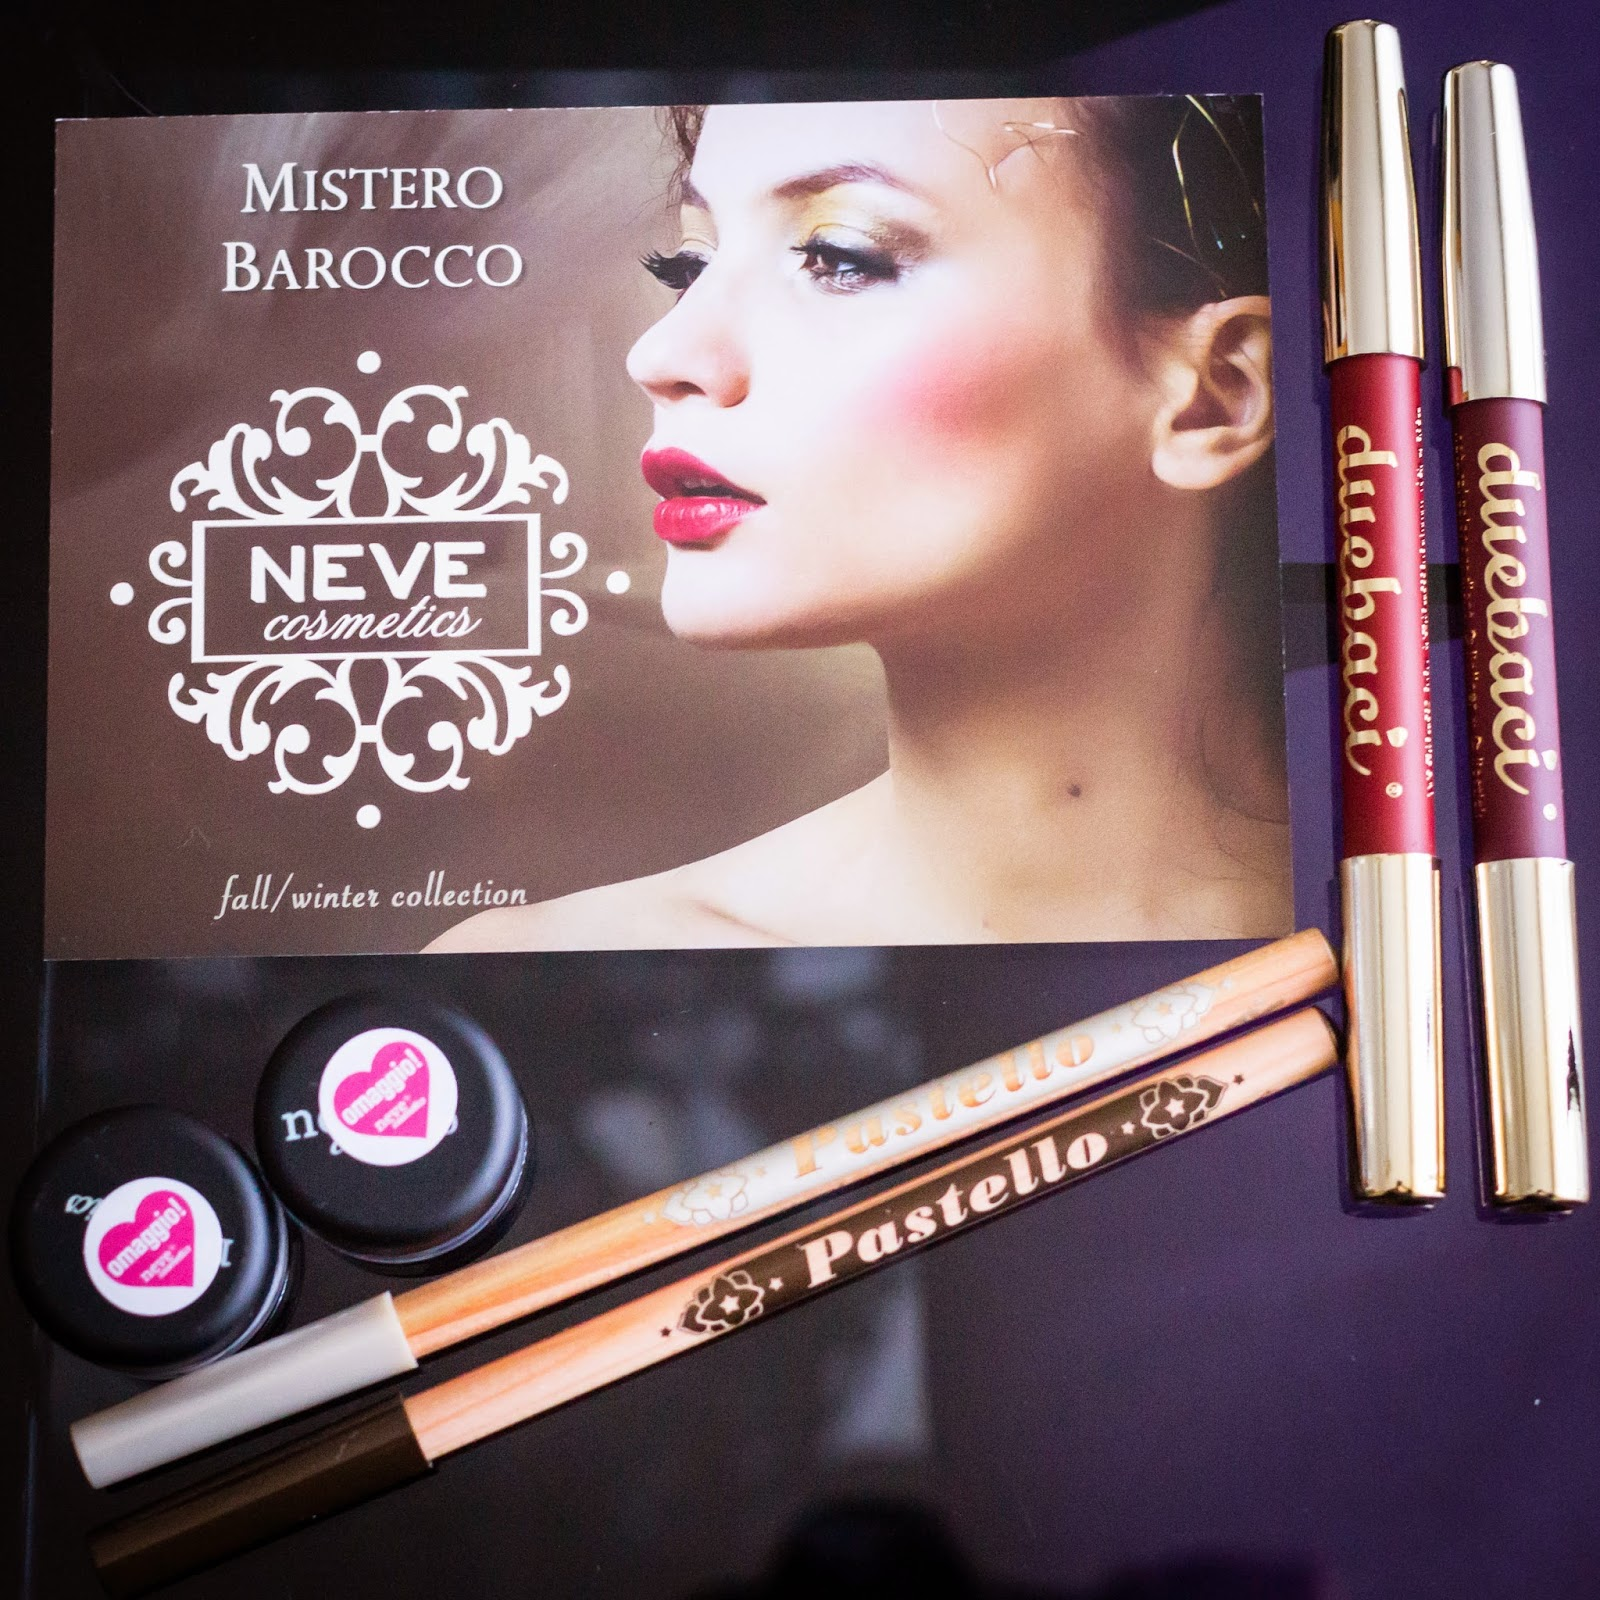 Mistero Barocco - Neve cosmetics